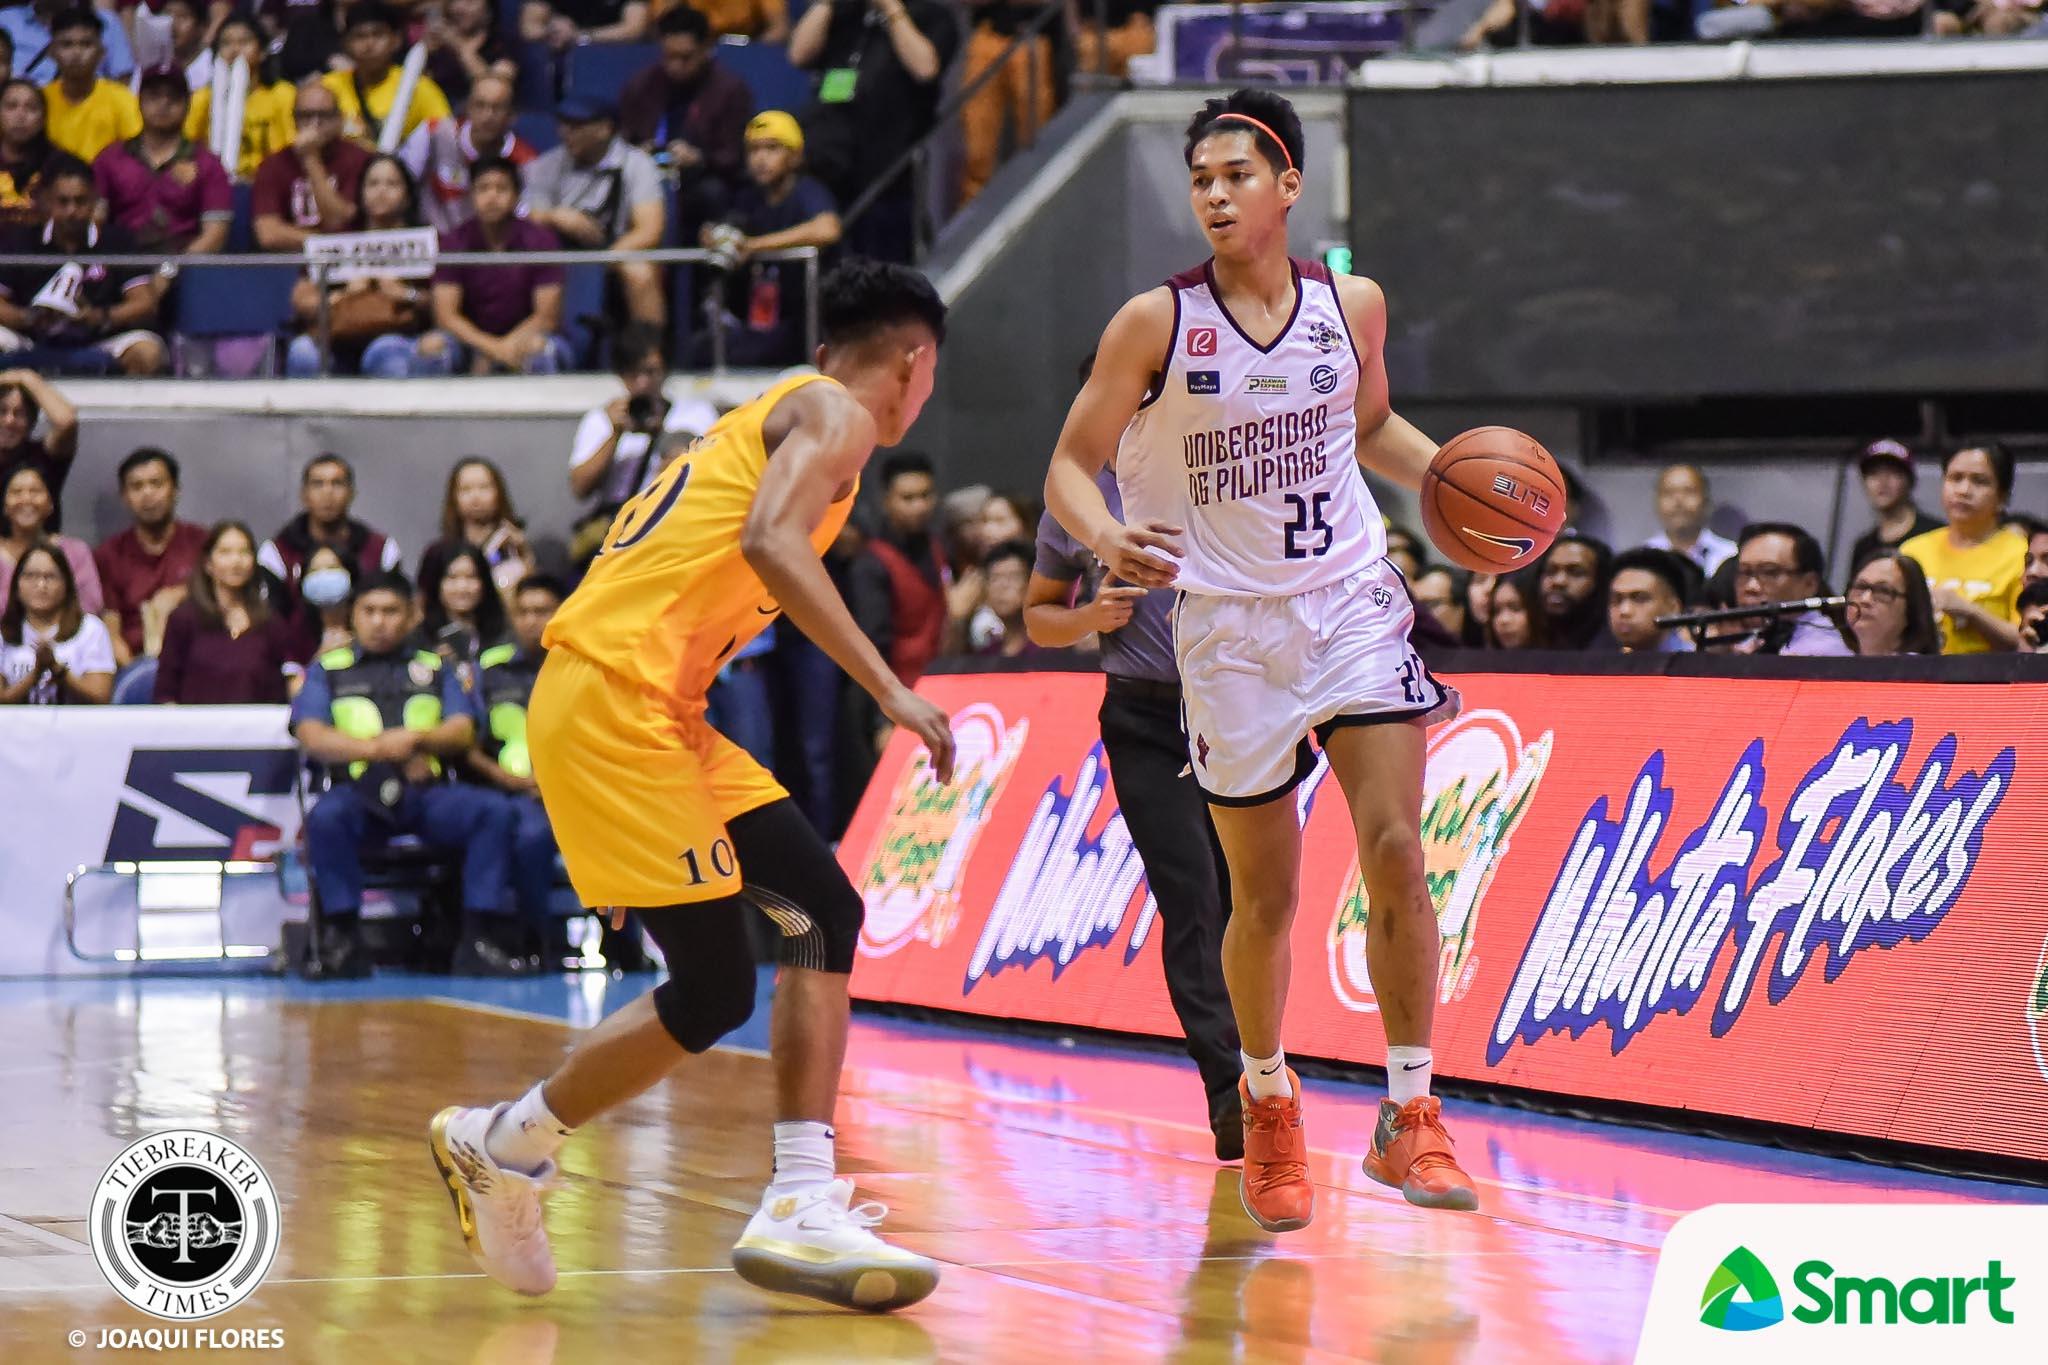 Tiebreaker Times Ricci Rivero downplays hand injury Basketball News UAAP UP  UP Men's Basketball UAAP Season 82 Men's Basketball UAAP Season 82 Ricci Rivero Bo Perasol